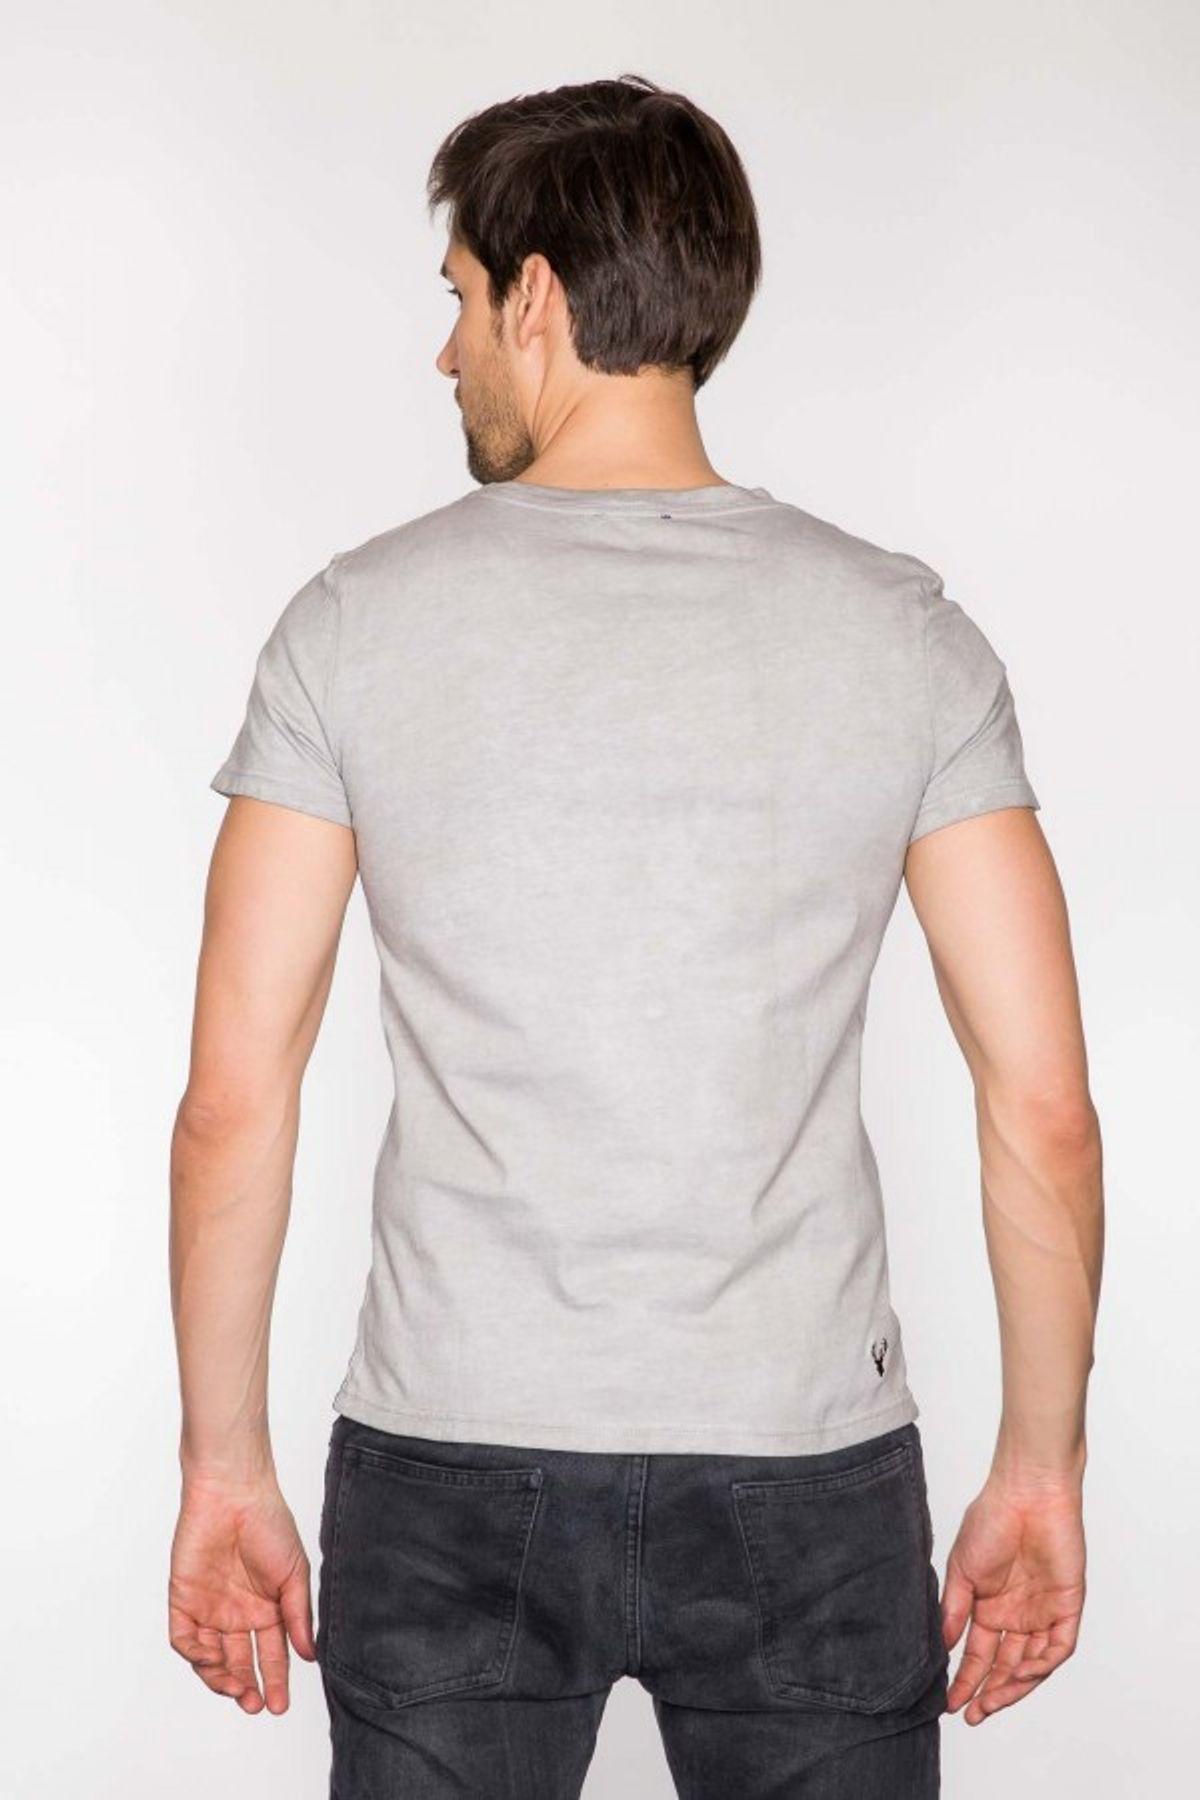 Krüger - Herren Trachten T-Shirt in grau, Grias Di (94200-43) – Bild 6